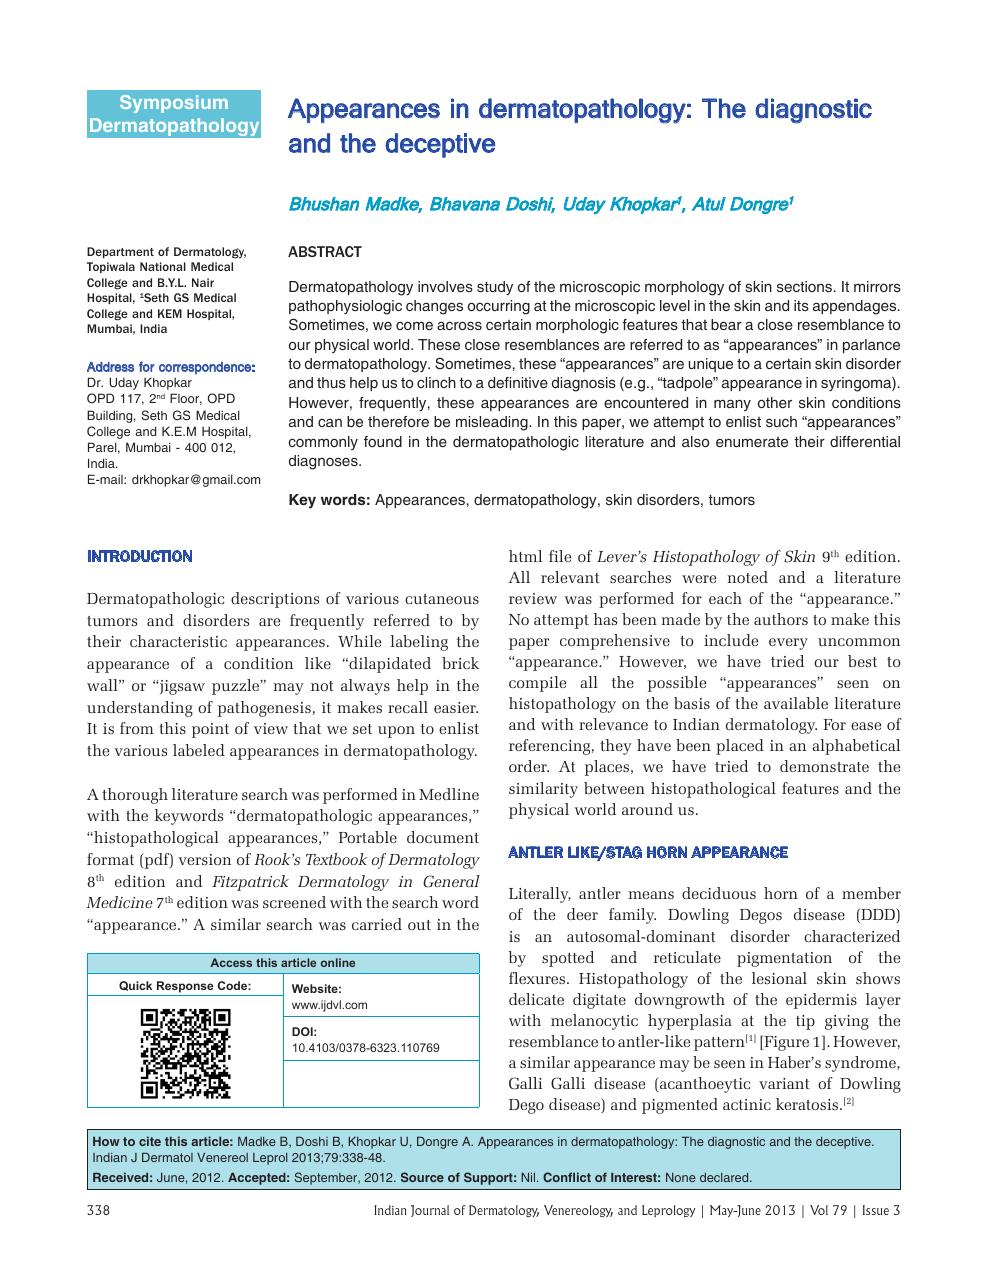 confluent reticulated papillomatosis ijdvl